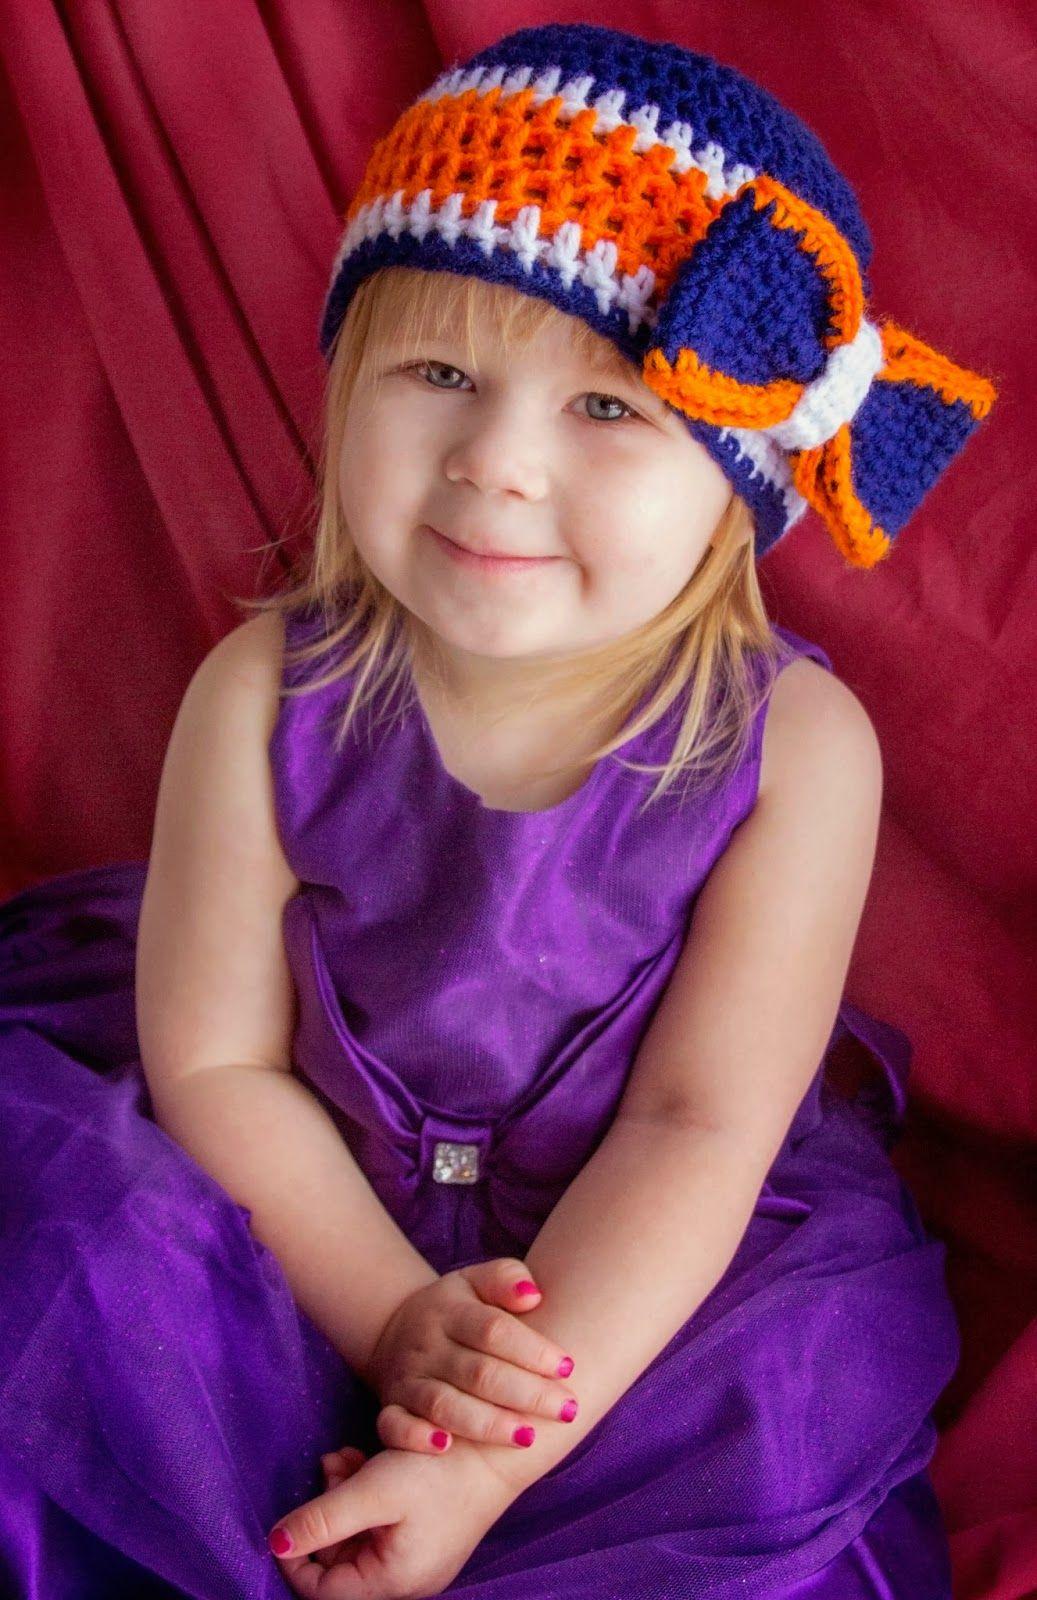 Manda Nicole\'s Crochet Patterns: Broncos Bow Beanie | My hobby is ...